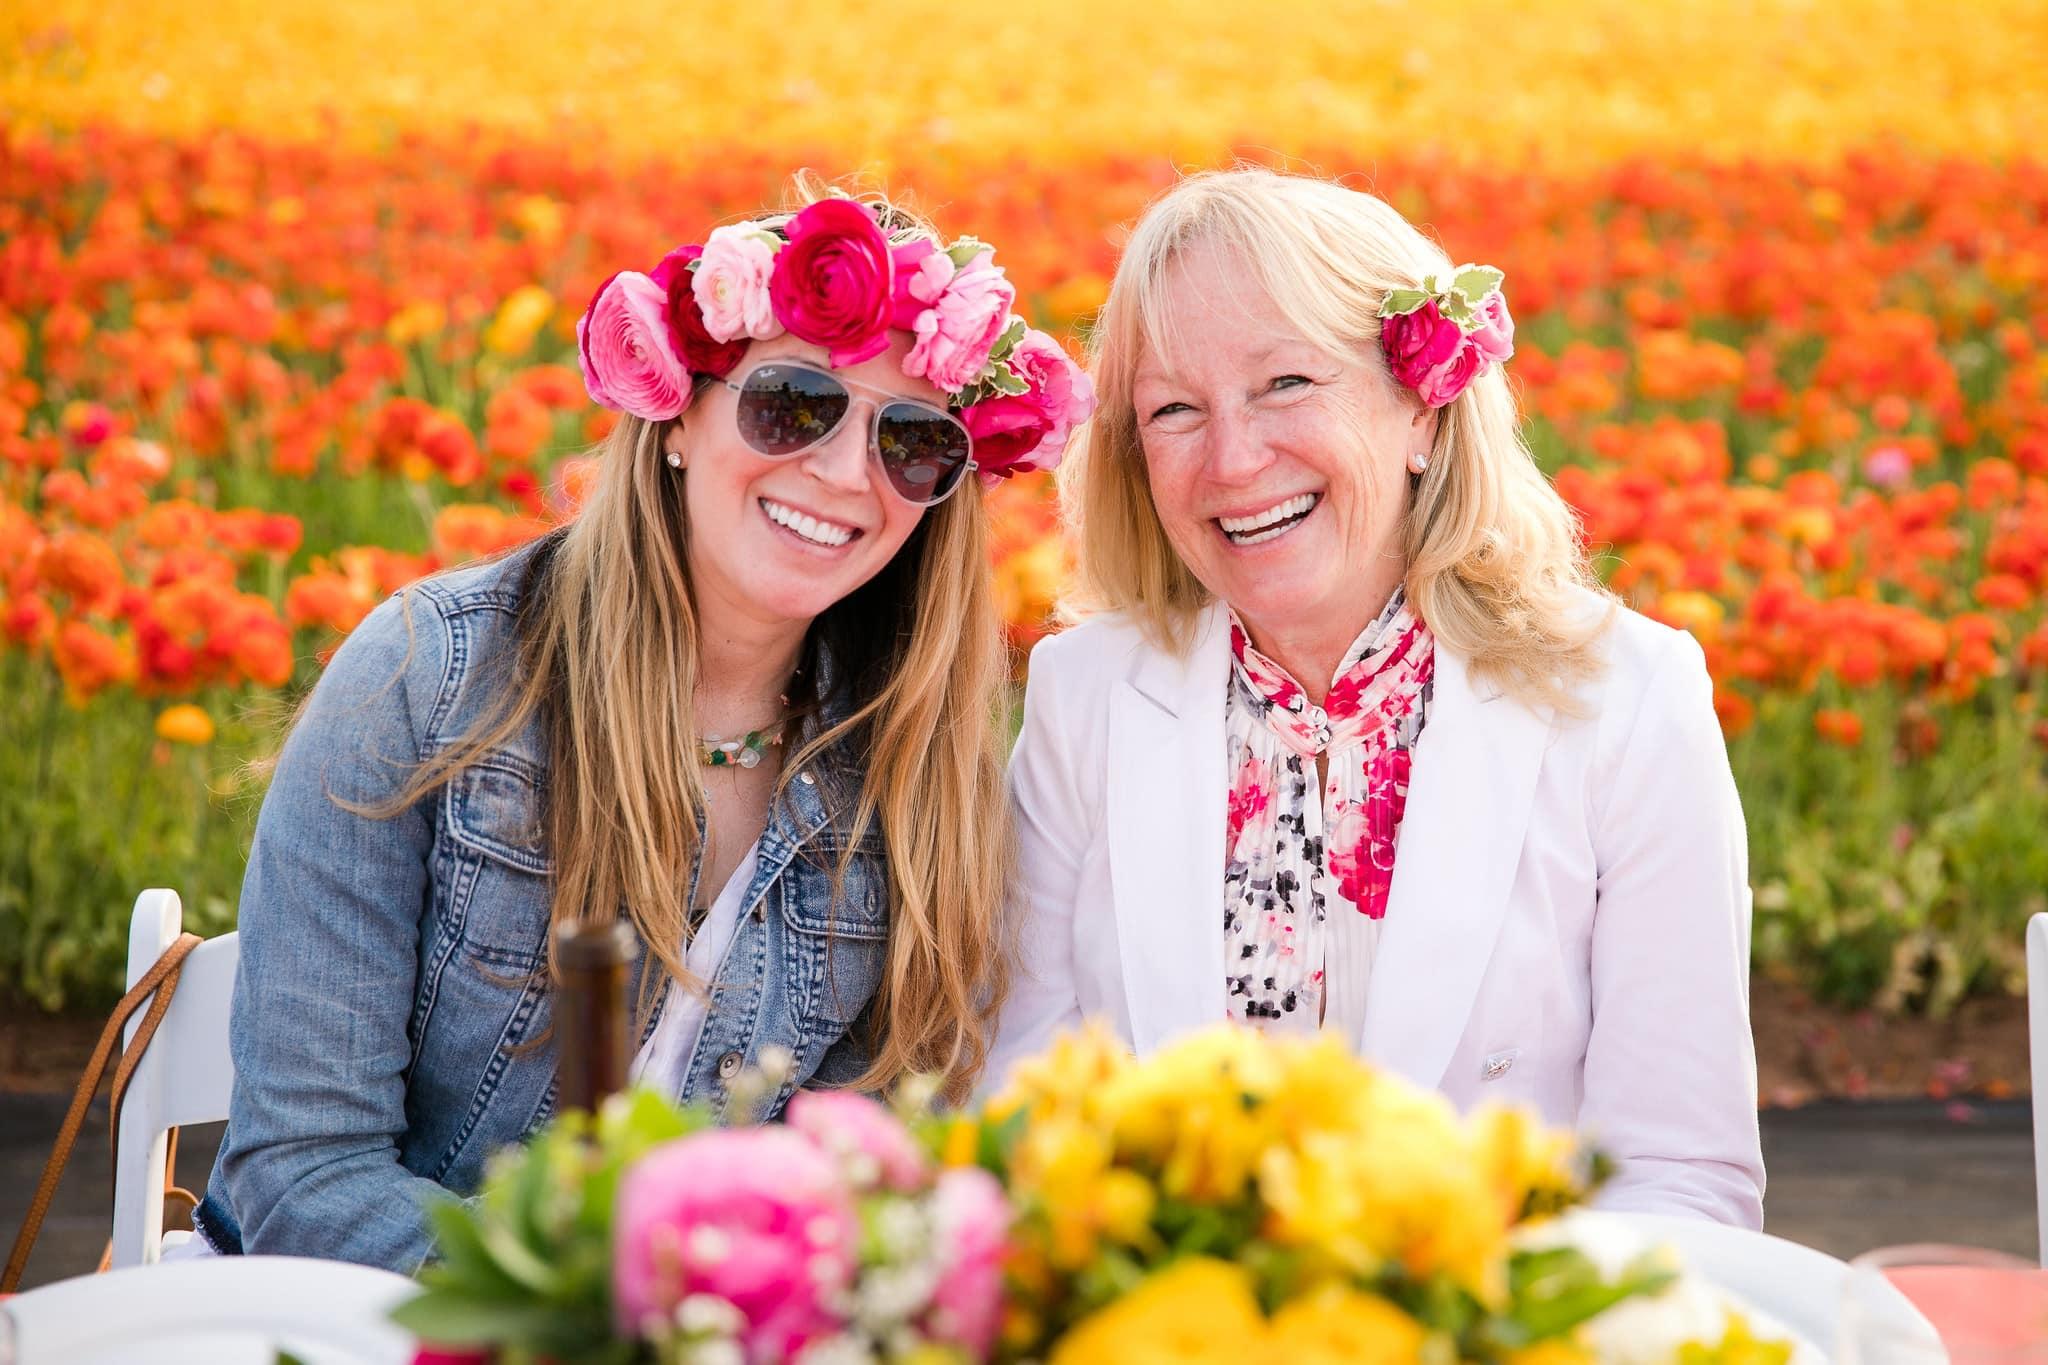 Two women sitting in front of field of flowers.